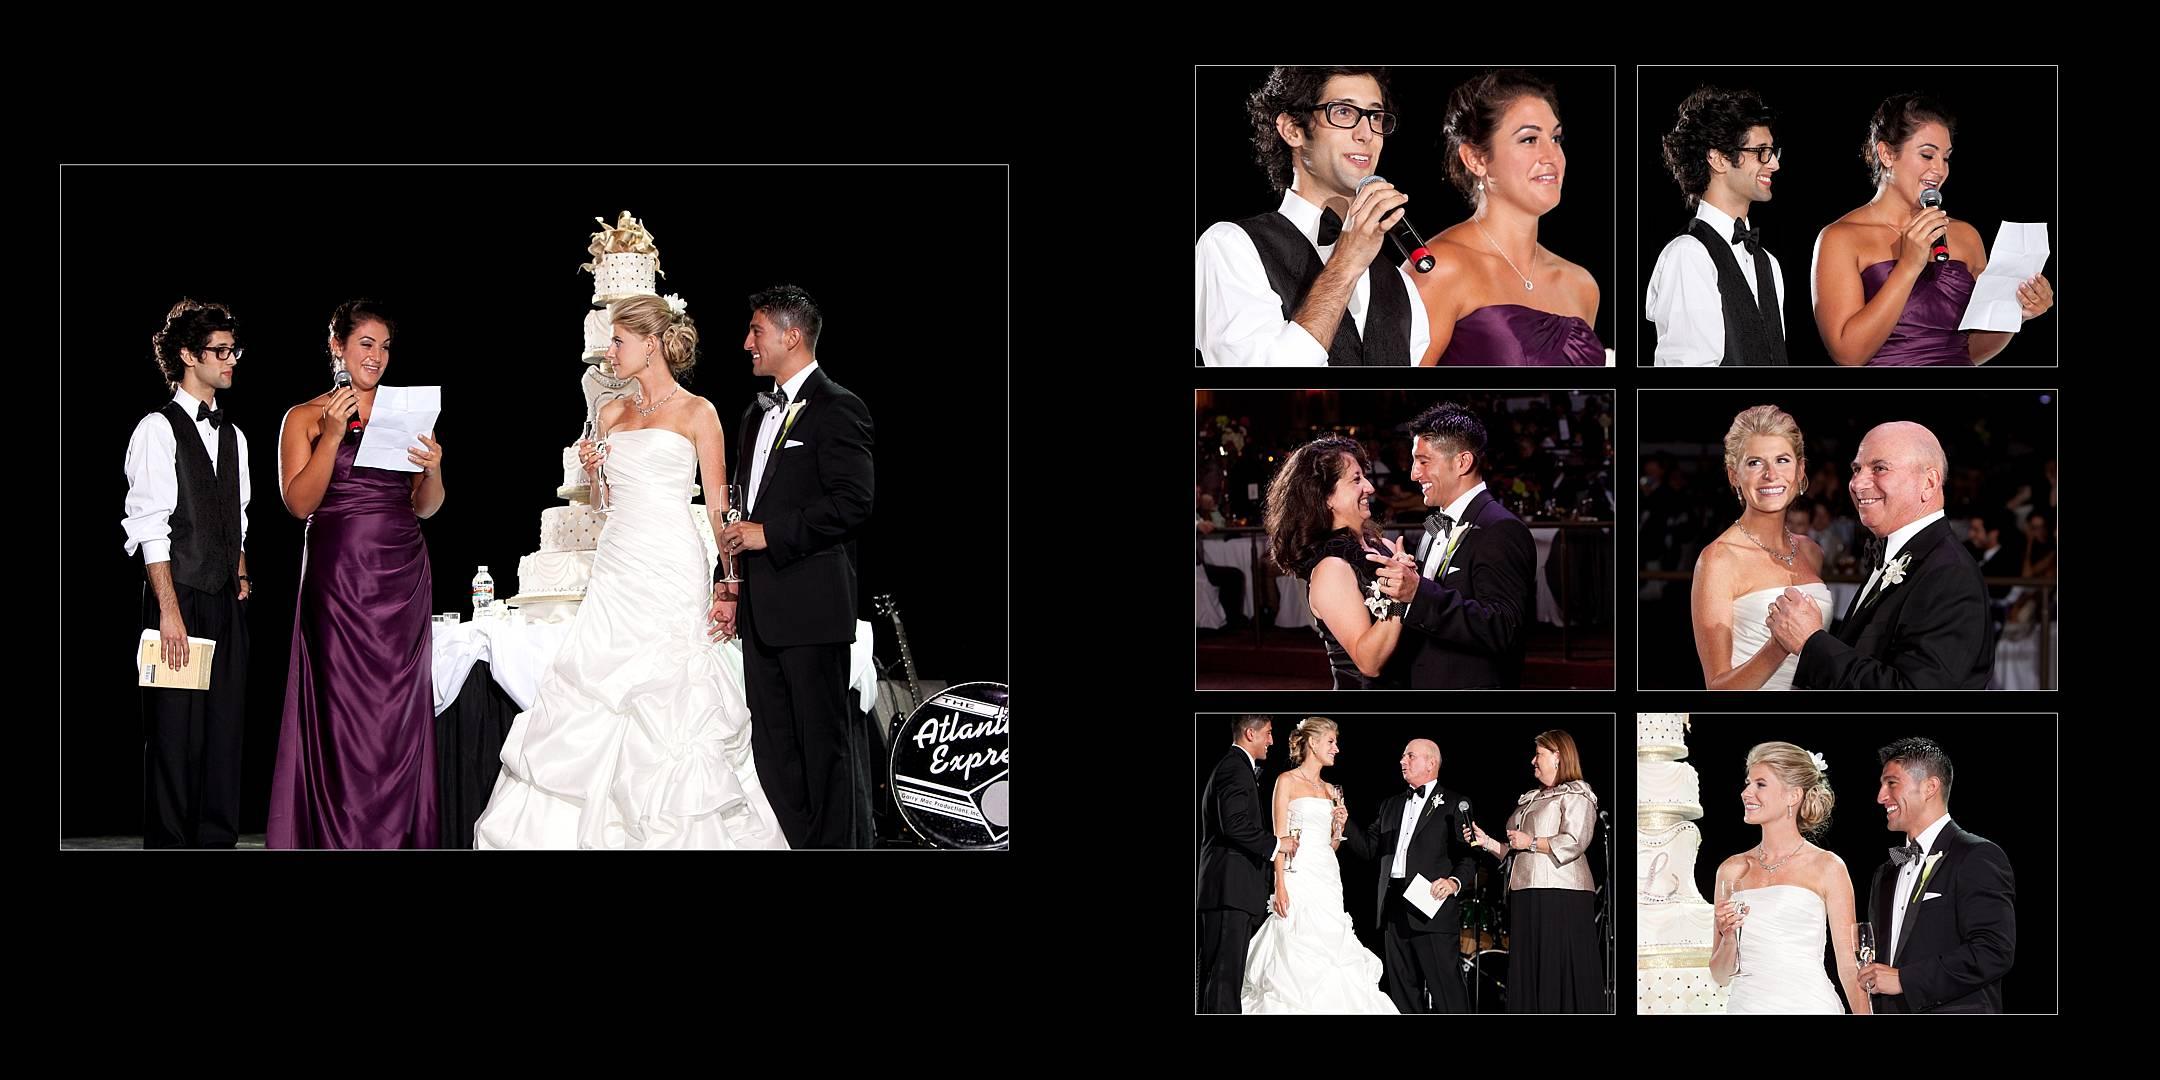 schmidt-photo-wedding-photography-chicago_2308